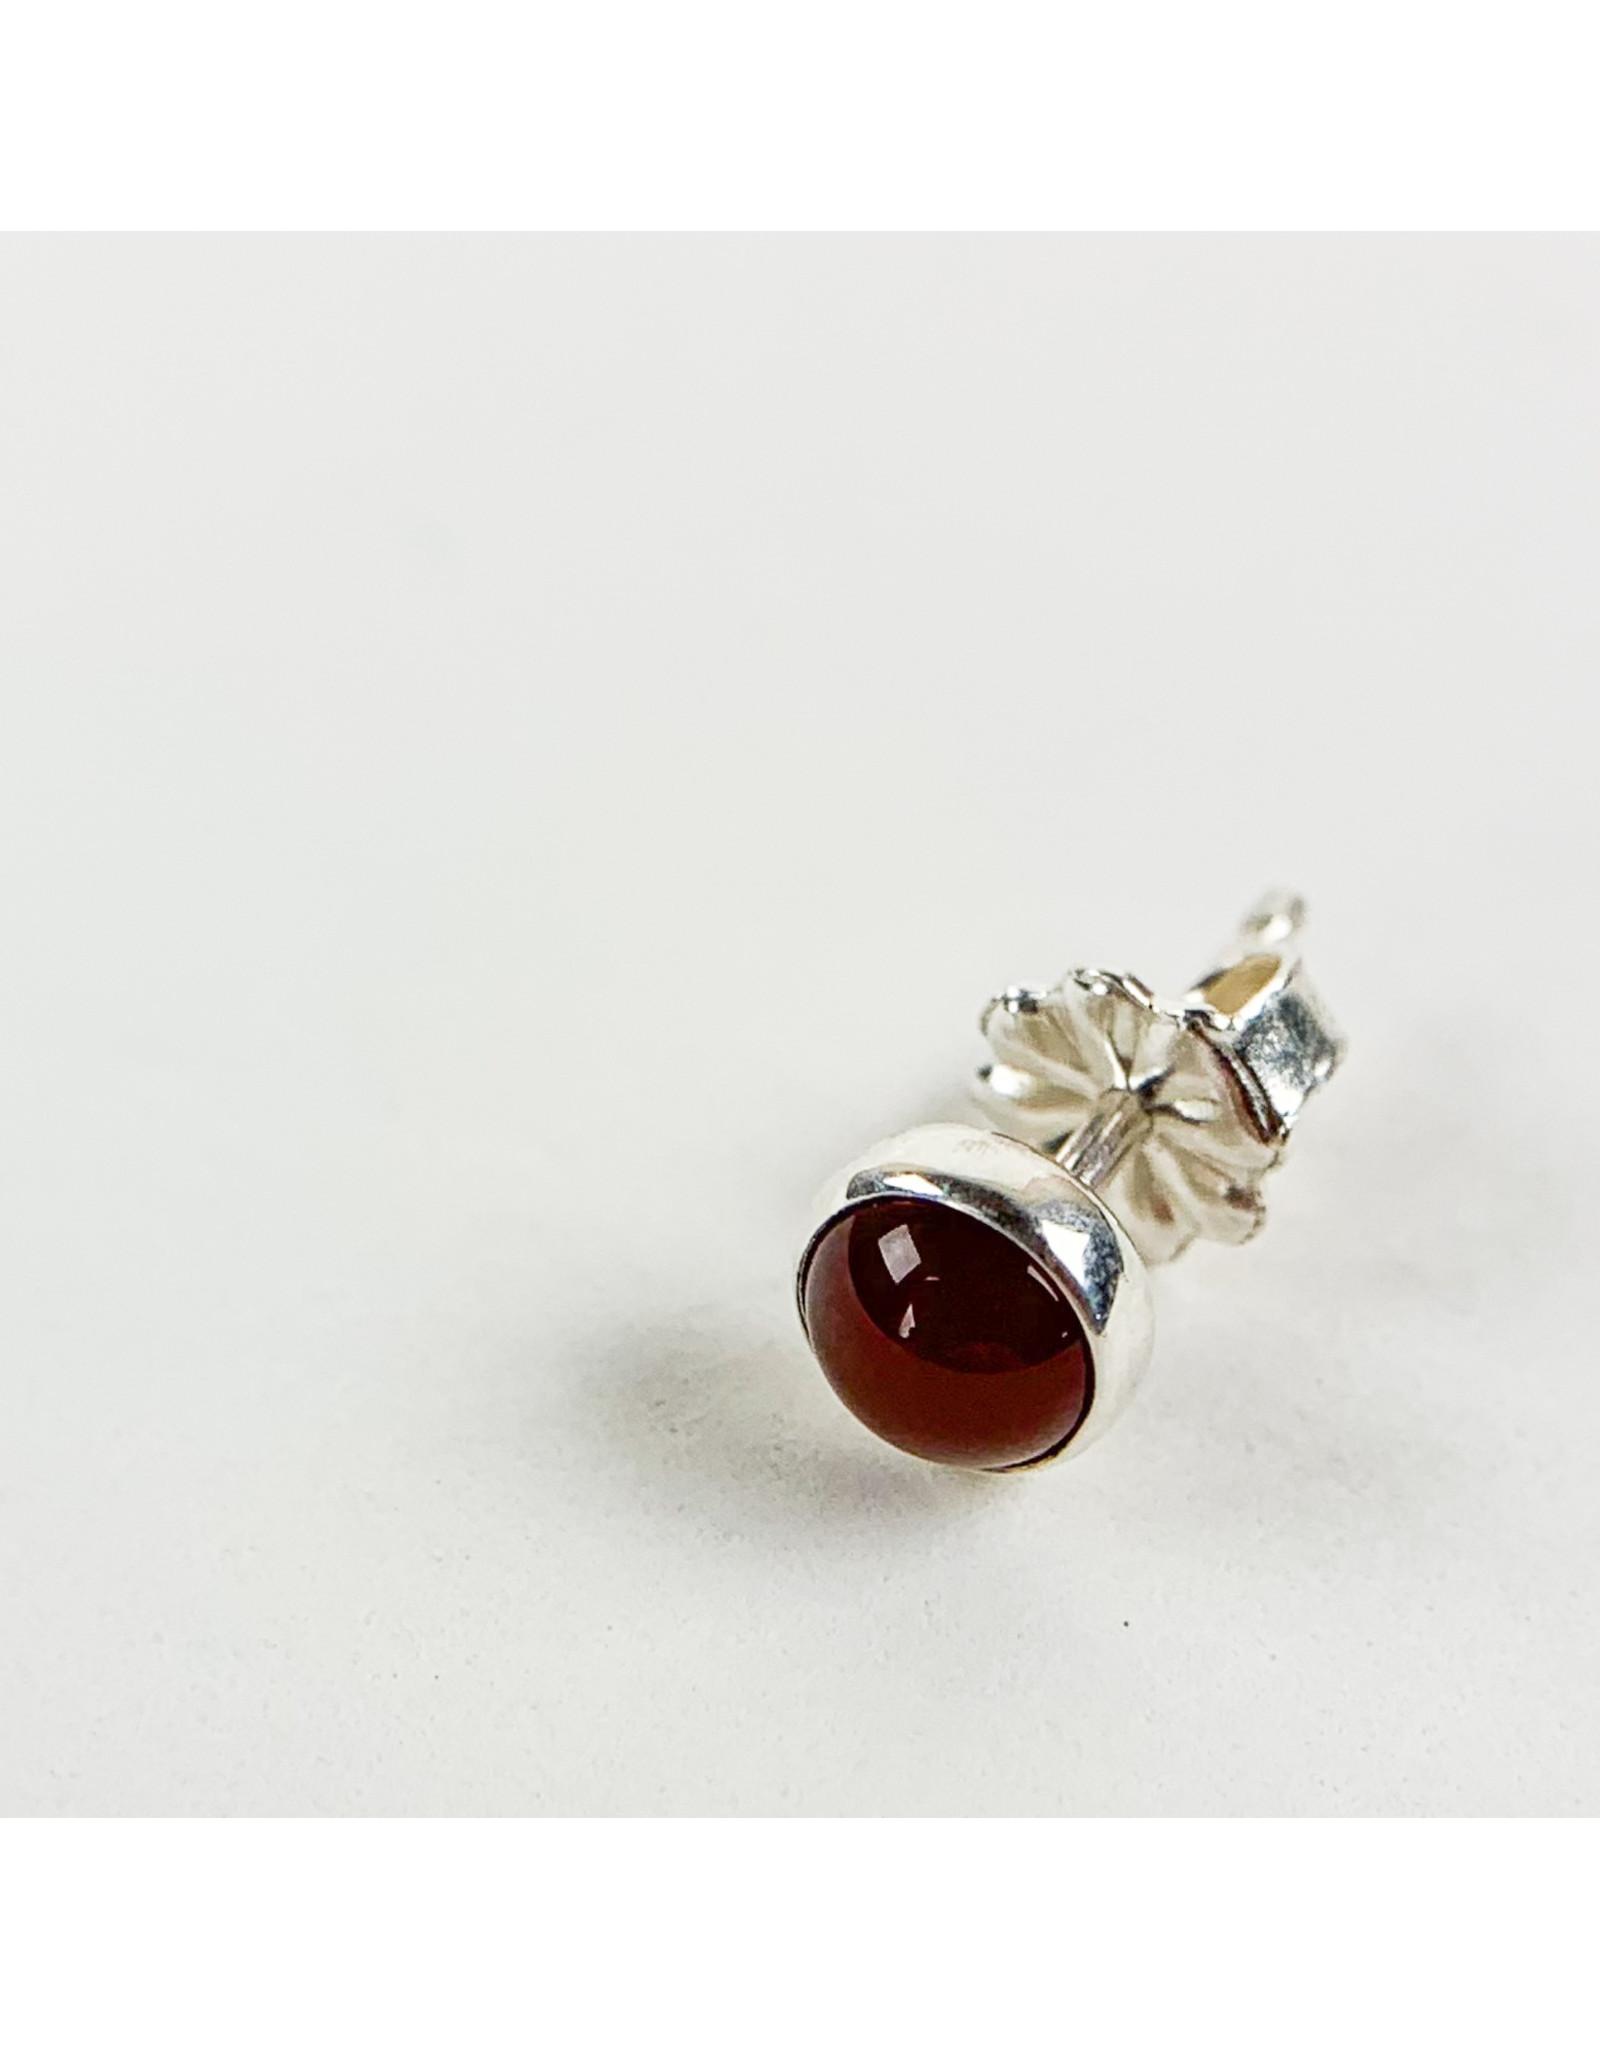 Camille Hempel Jewelry-Consignment CHSS7 Carnelian